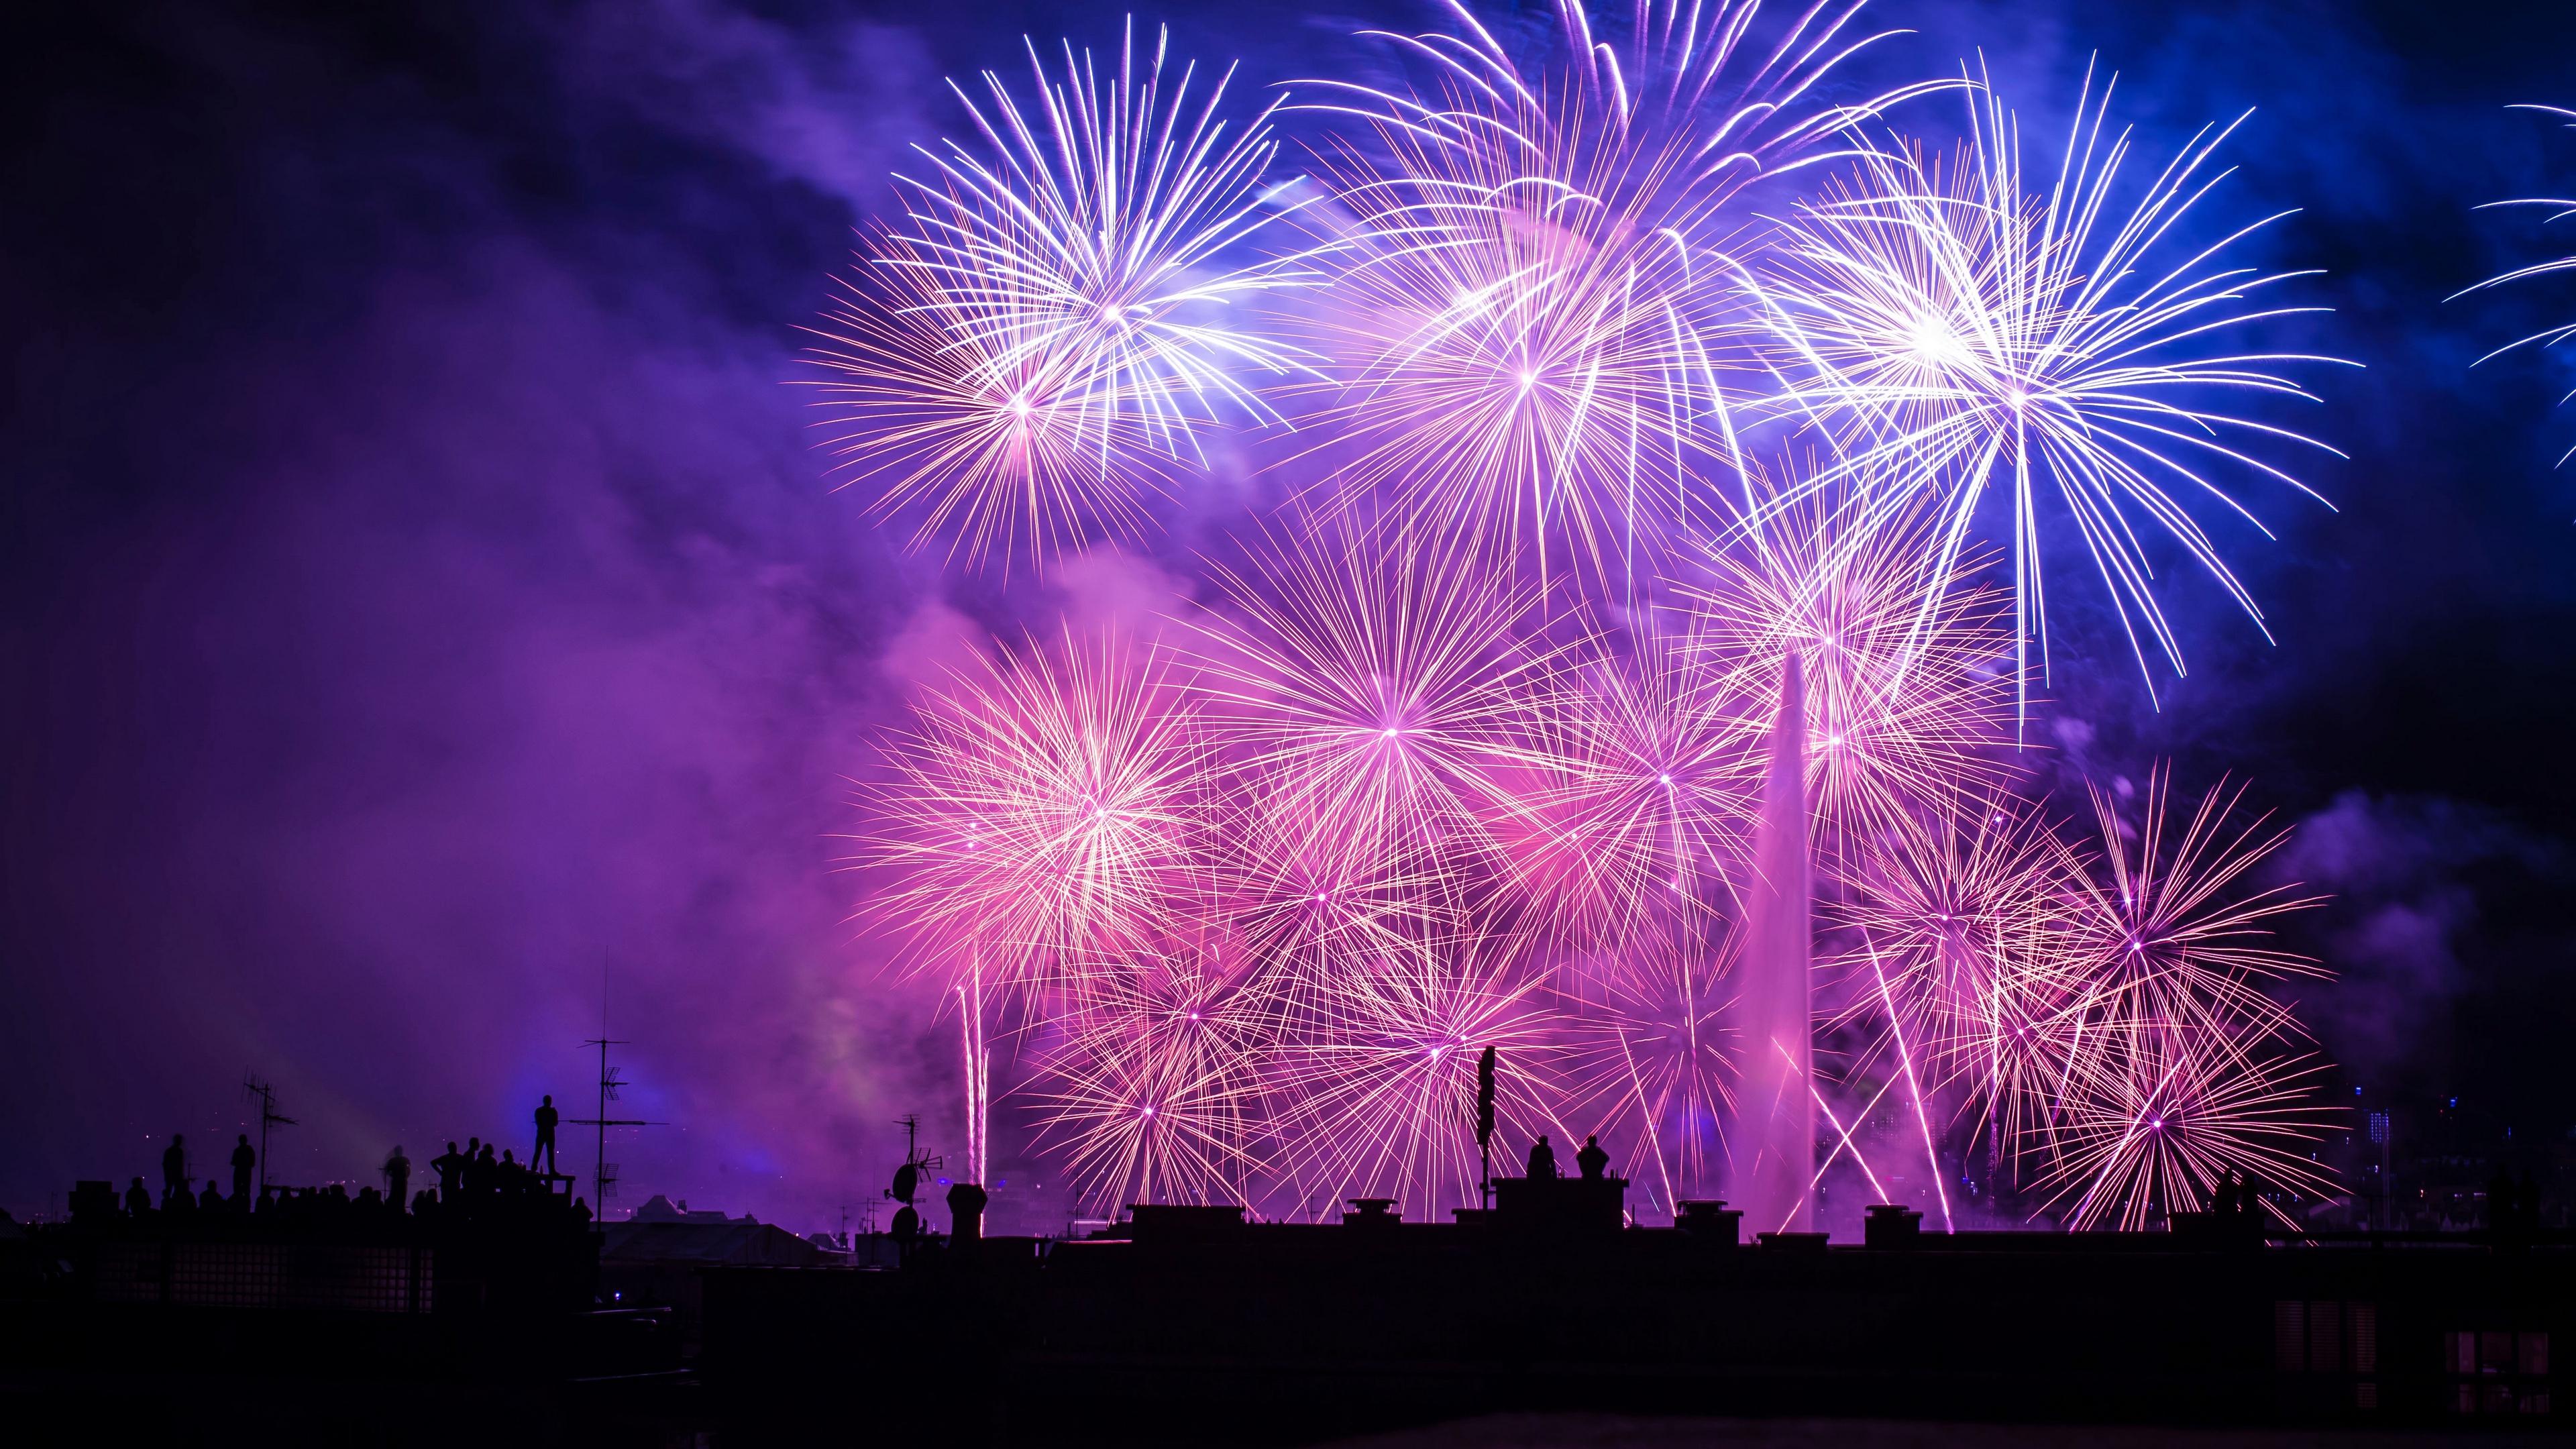 salute night fireworks beautiful 4k 1538345354 - salute, night, fireworks, beautiful 4k - salute, Night, Fireworks